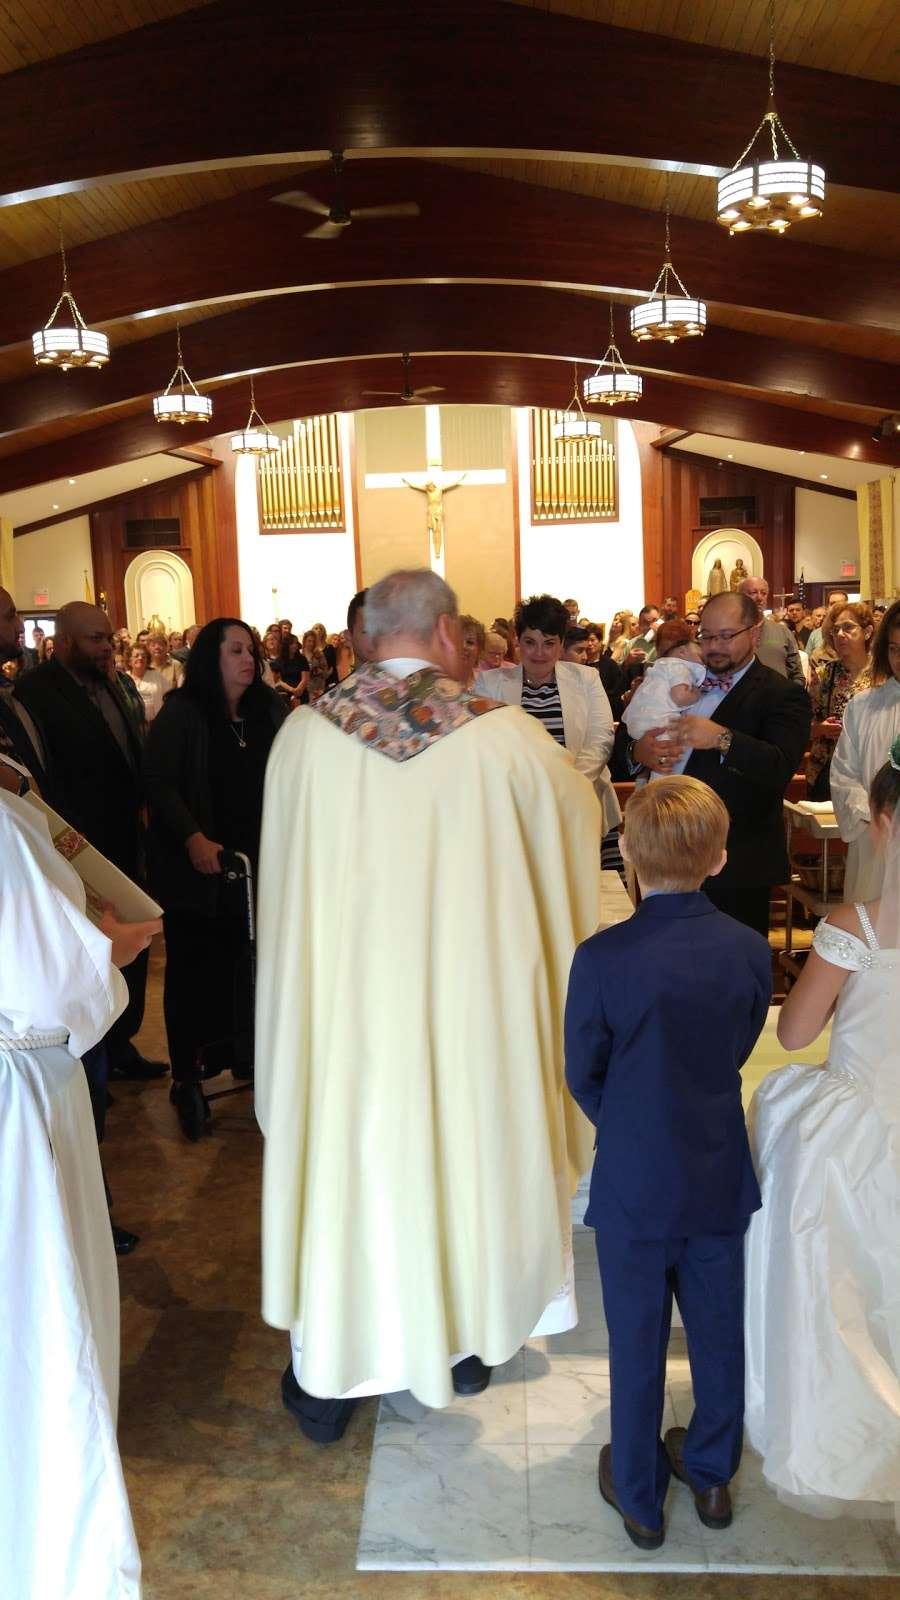 St. Margarets of Cortona Church - church  | Photo 5 of 10 | Address: 31 Chamberlain Ave, Little Ferry, NJ 07643, USA | Phone: (201) 641-2988